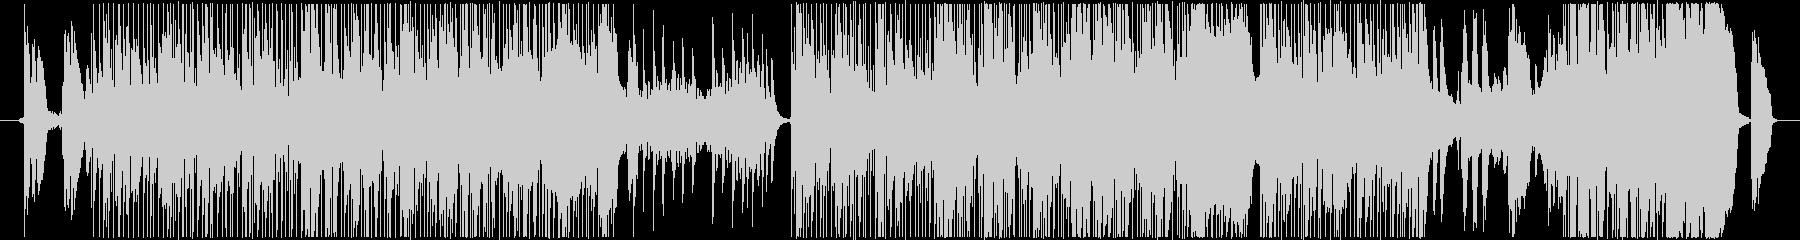 C-POPなギター曲の未再生の波形